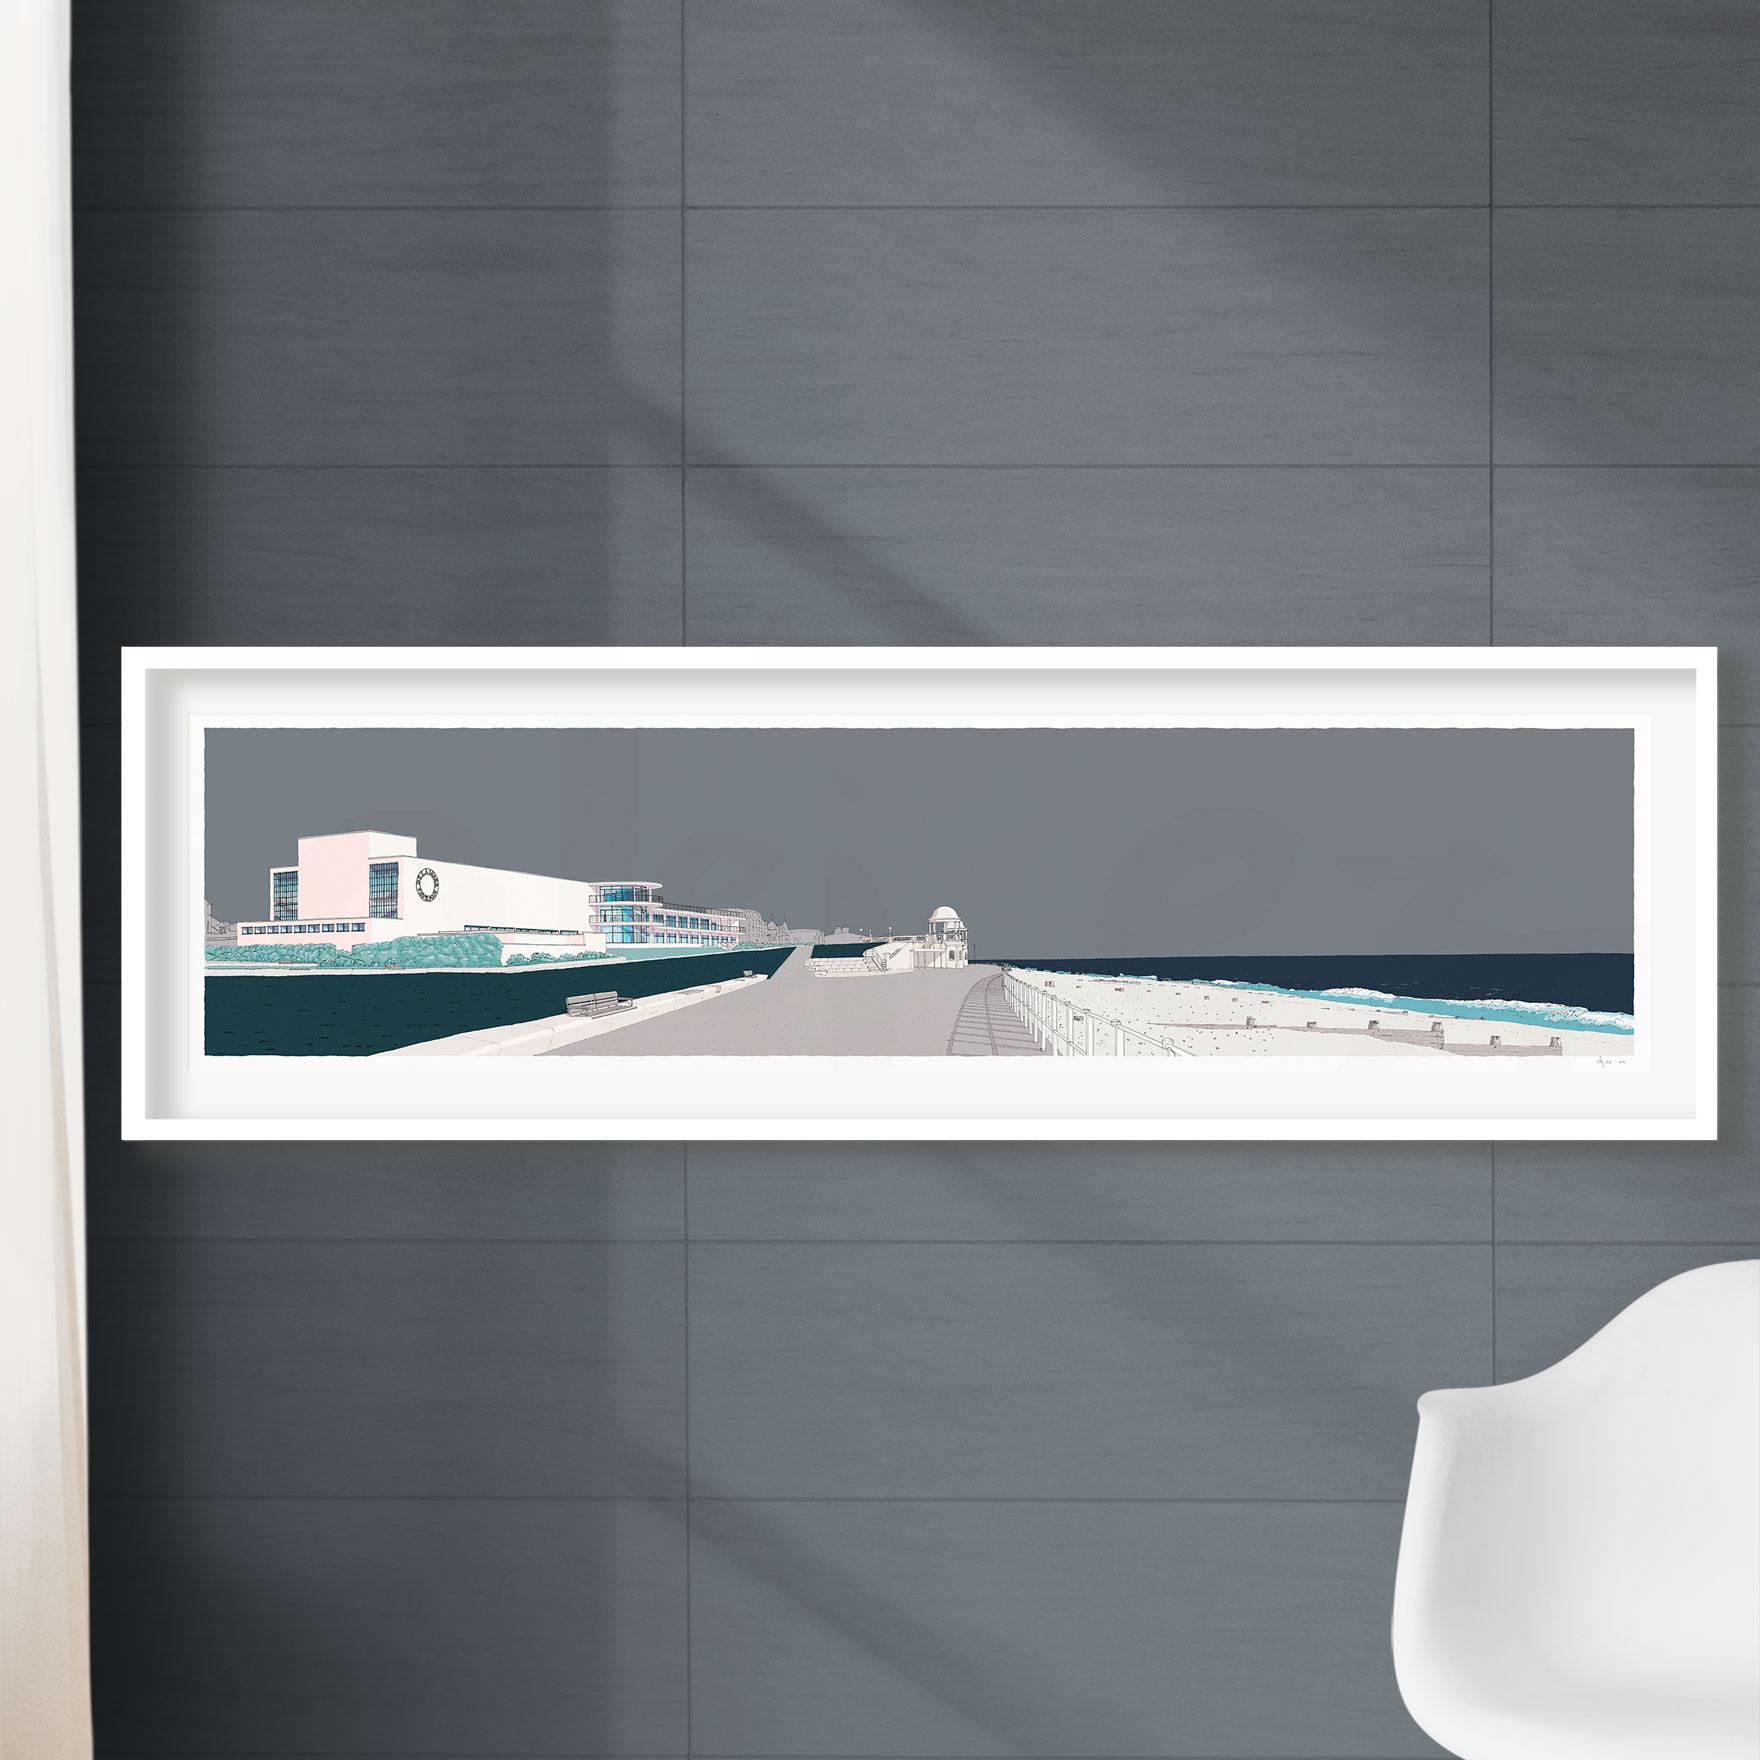 framed print by artist alej ez named De la Warr Pavilion Bexhill on Sea Silver Grey